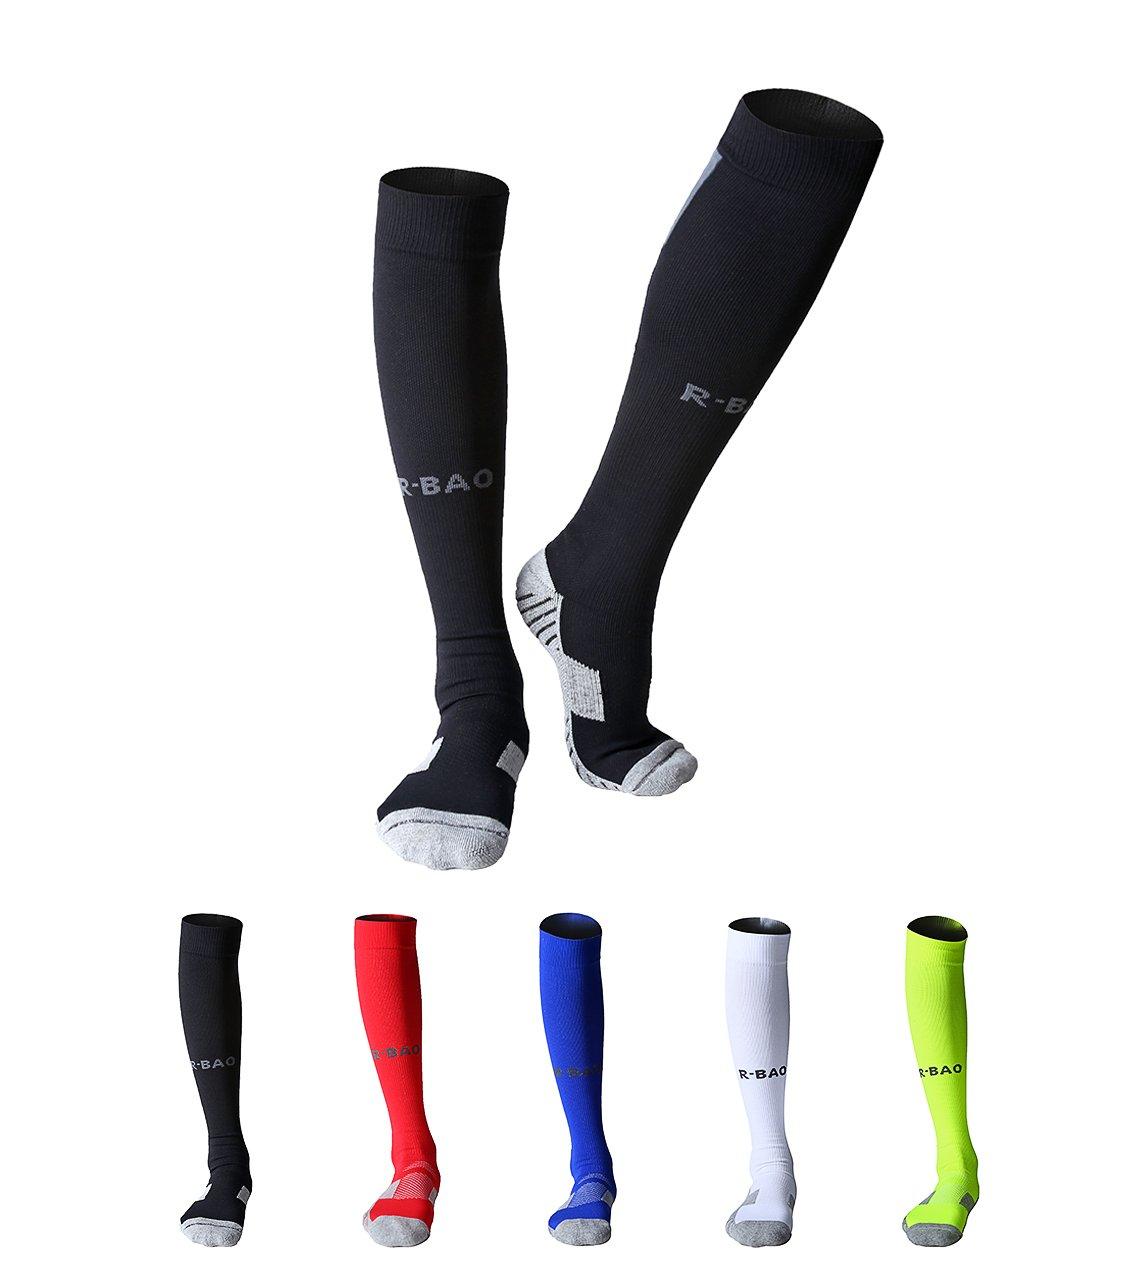 Maibuメンズ2ペアアスレチックソックスソフトコットンクッション圧縮FootballバスケットボールRunning Exerciseソックス B01MA0VN6M Black 2 pairs Black 2 pairs